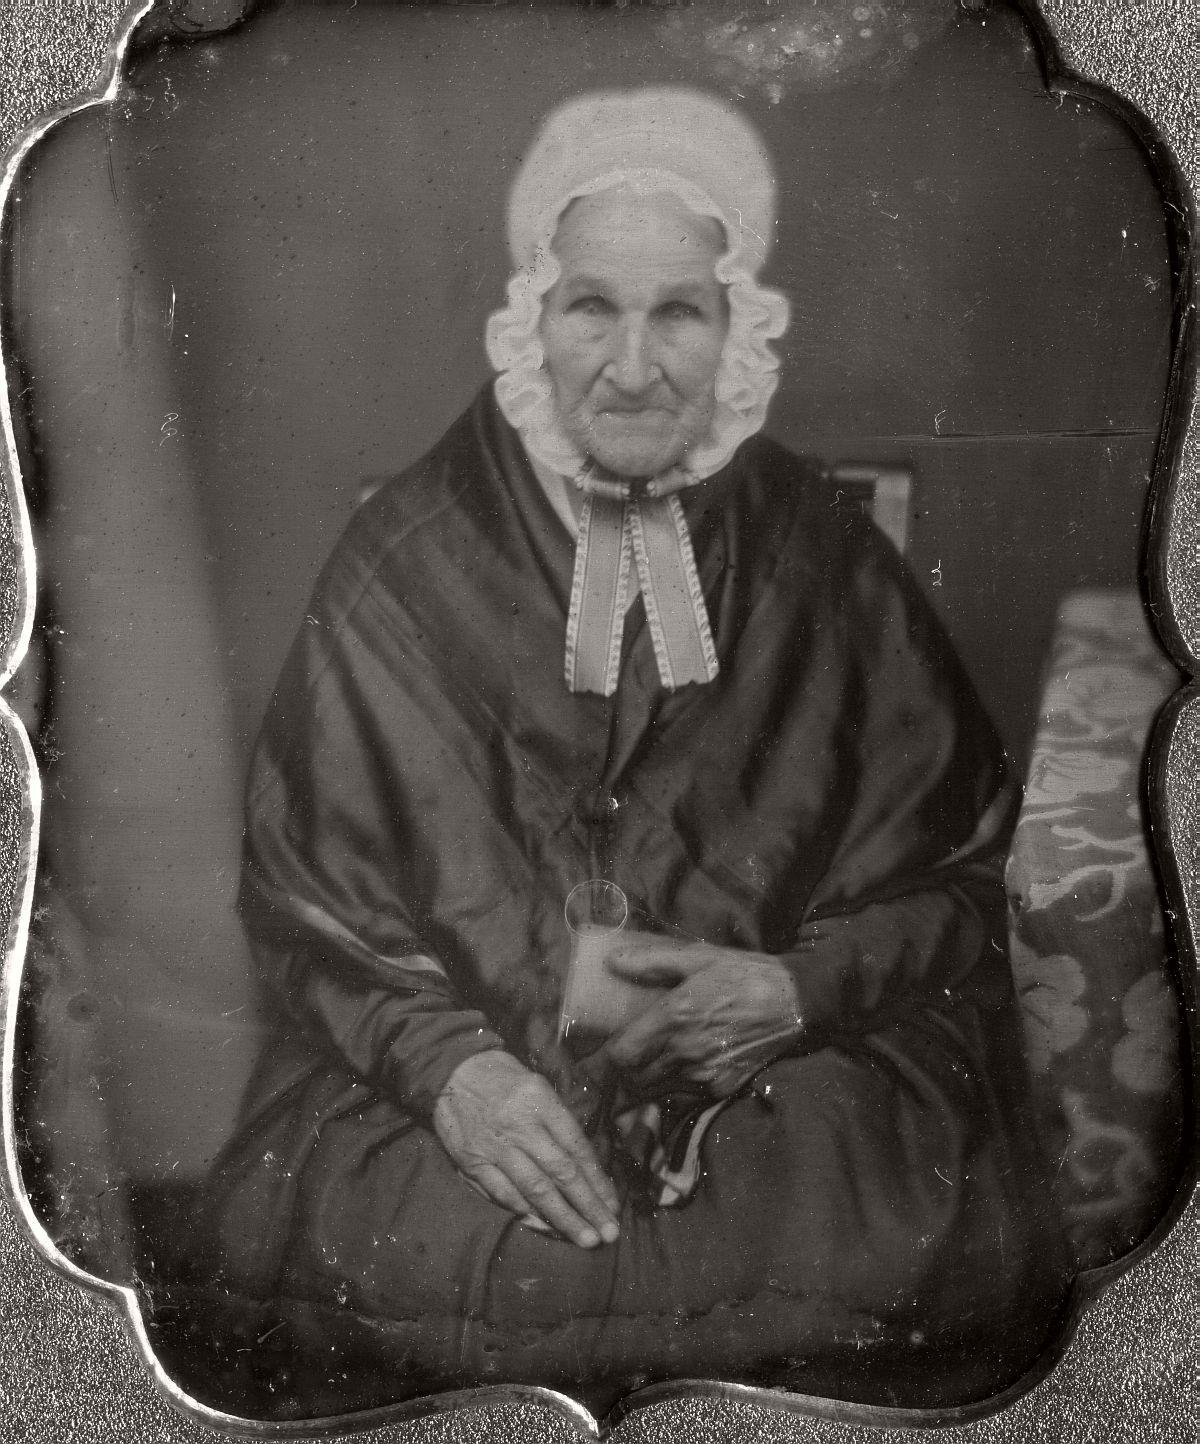 daguerreotype-portrait-ladies-born-in-the-late-18th-century-1700s-vintage-05